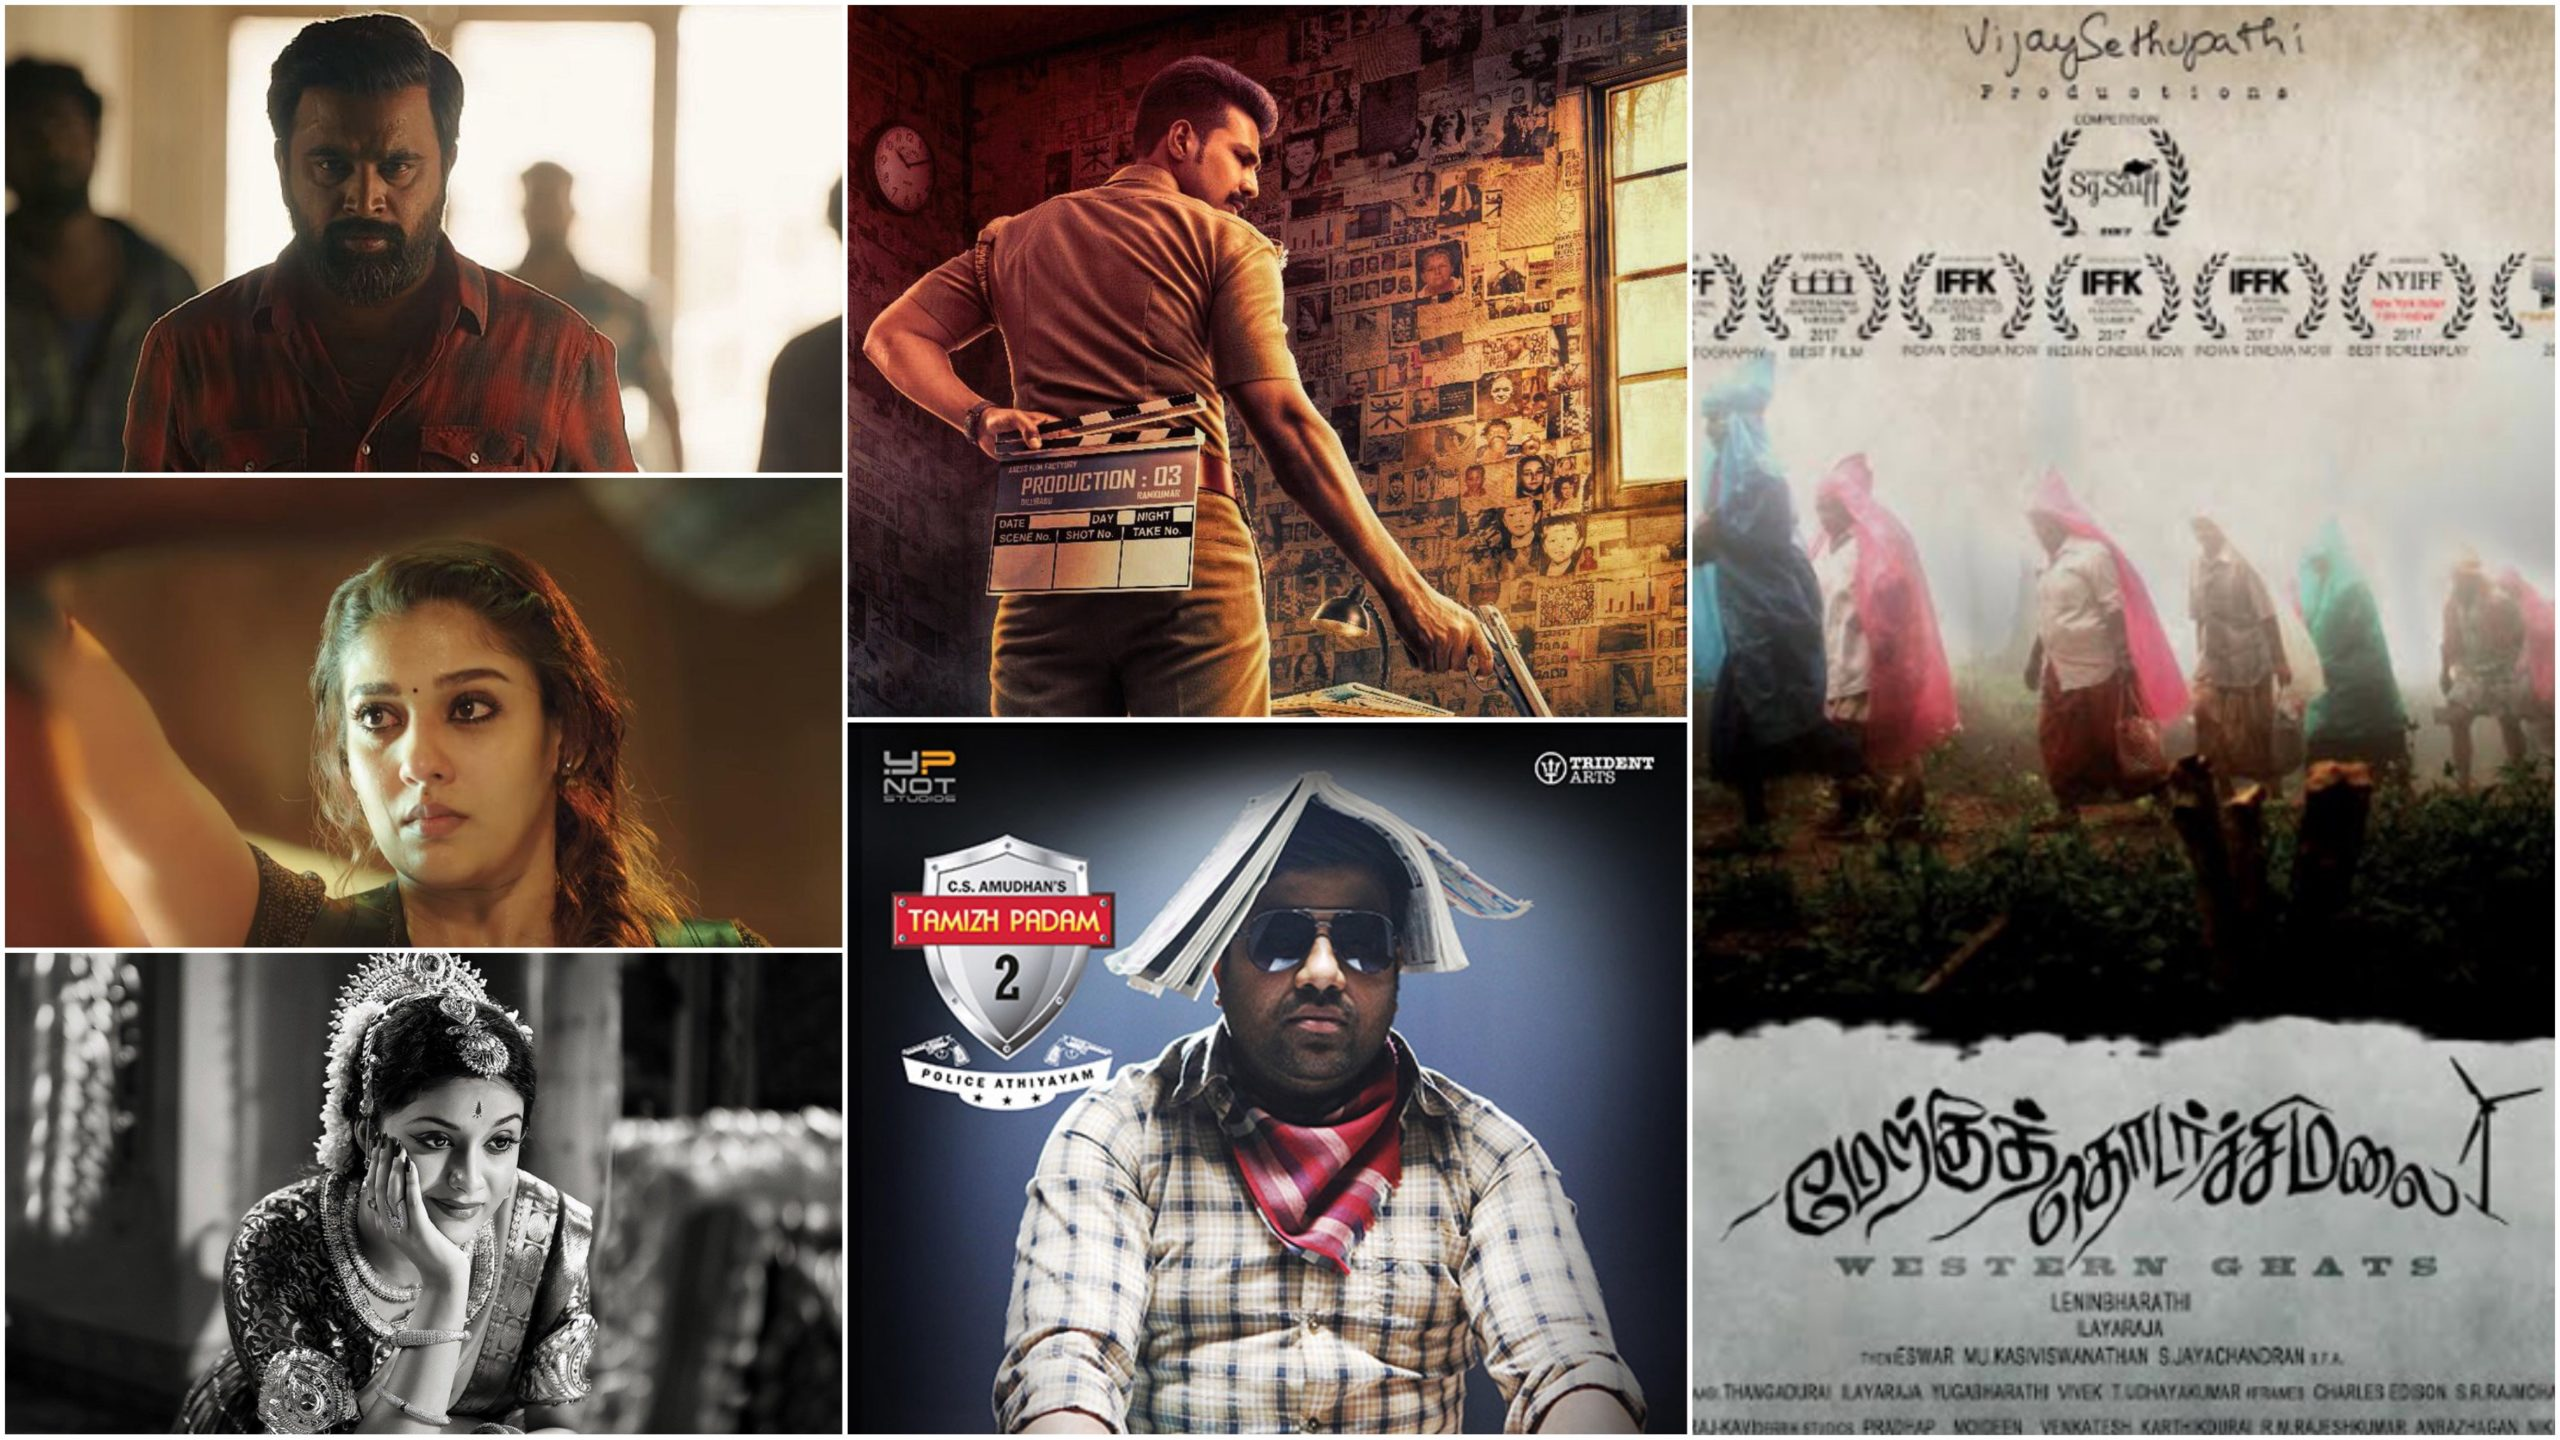 Tnmachi da 2021 Website : Tamil Ringtones, HD Movies Download - Is it legal?